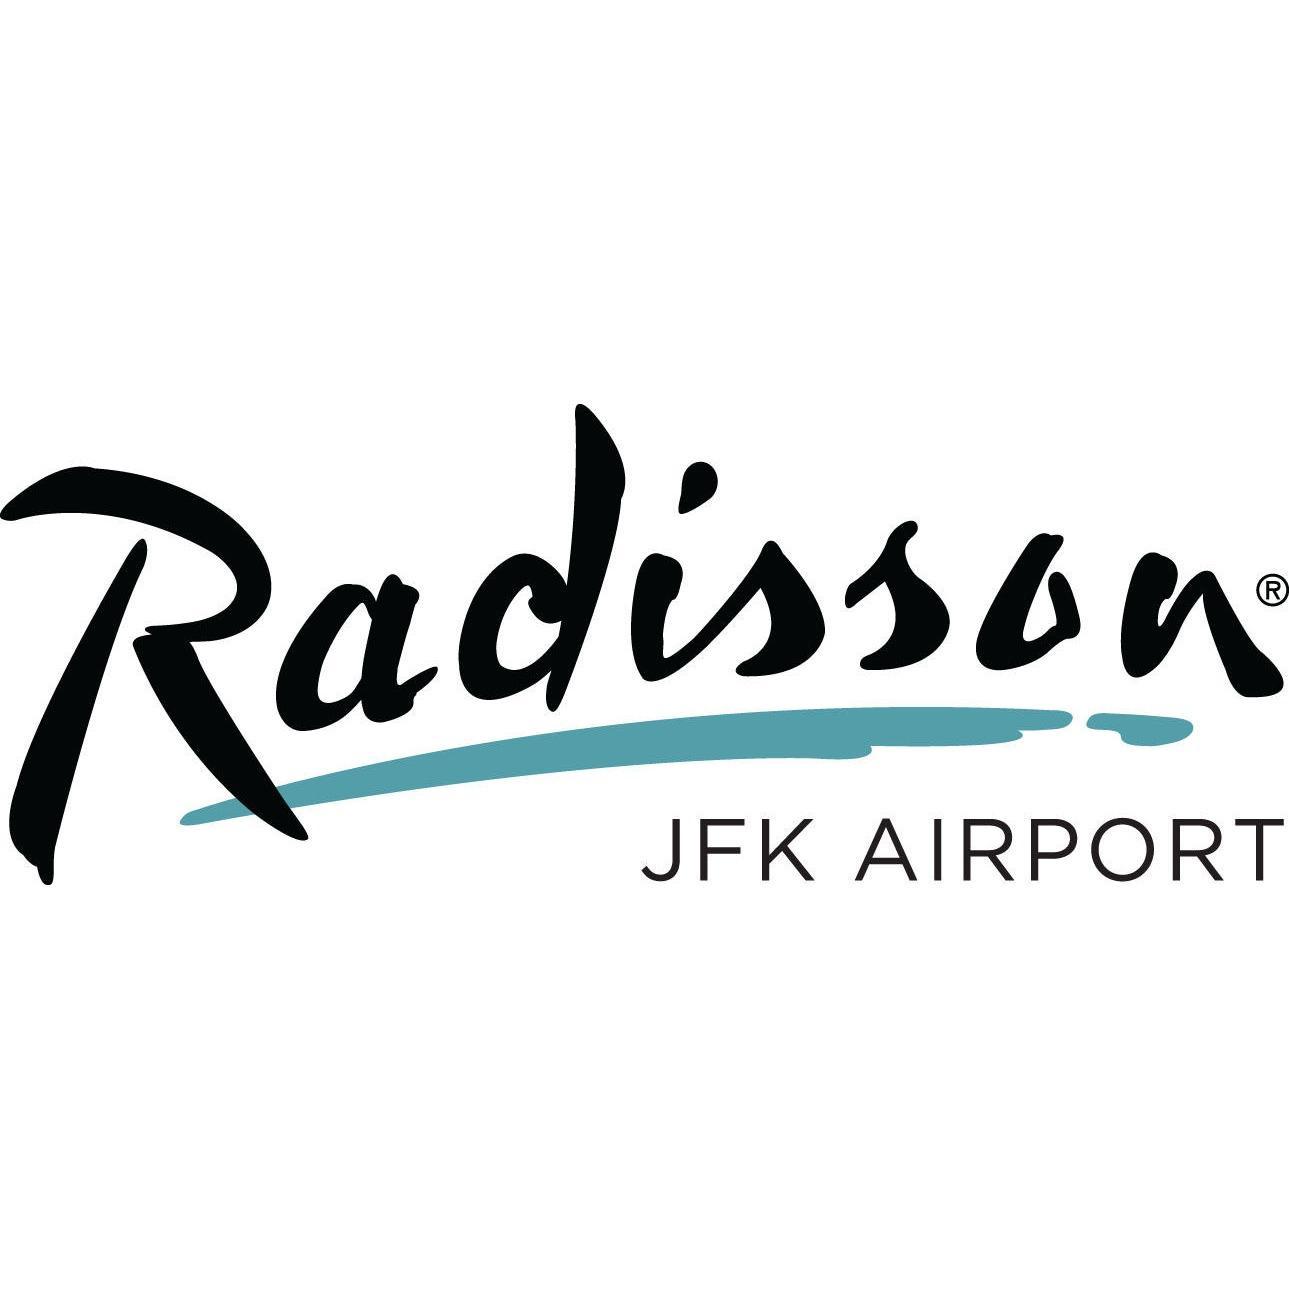 Radisson Hotel JFK Airport